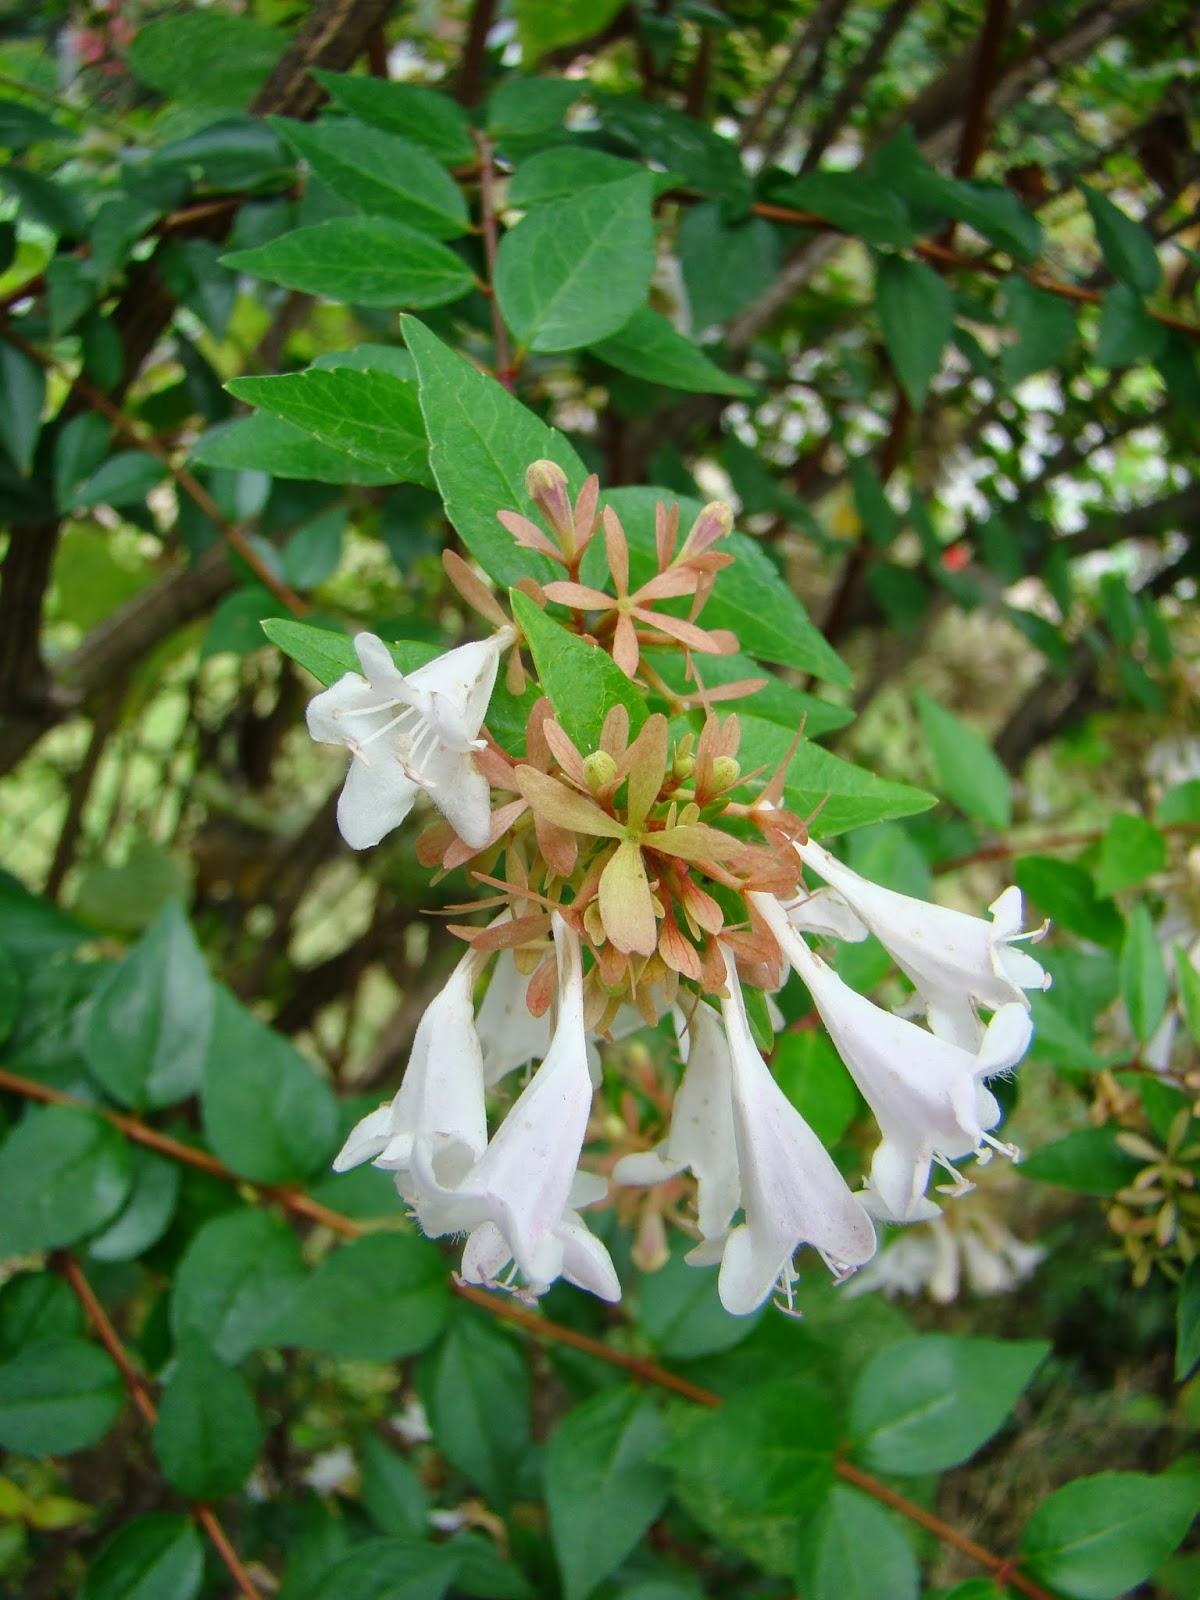 Georgia Market Bulletin Blog Arty S Garden Plant Glossy Abelia For Its Abilities